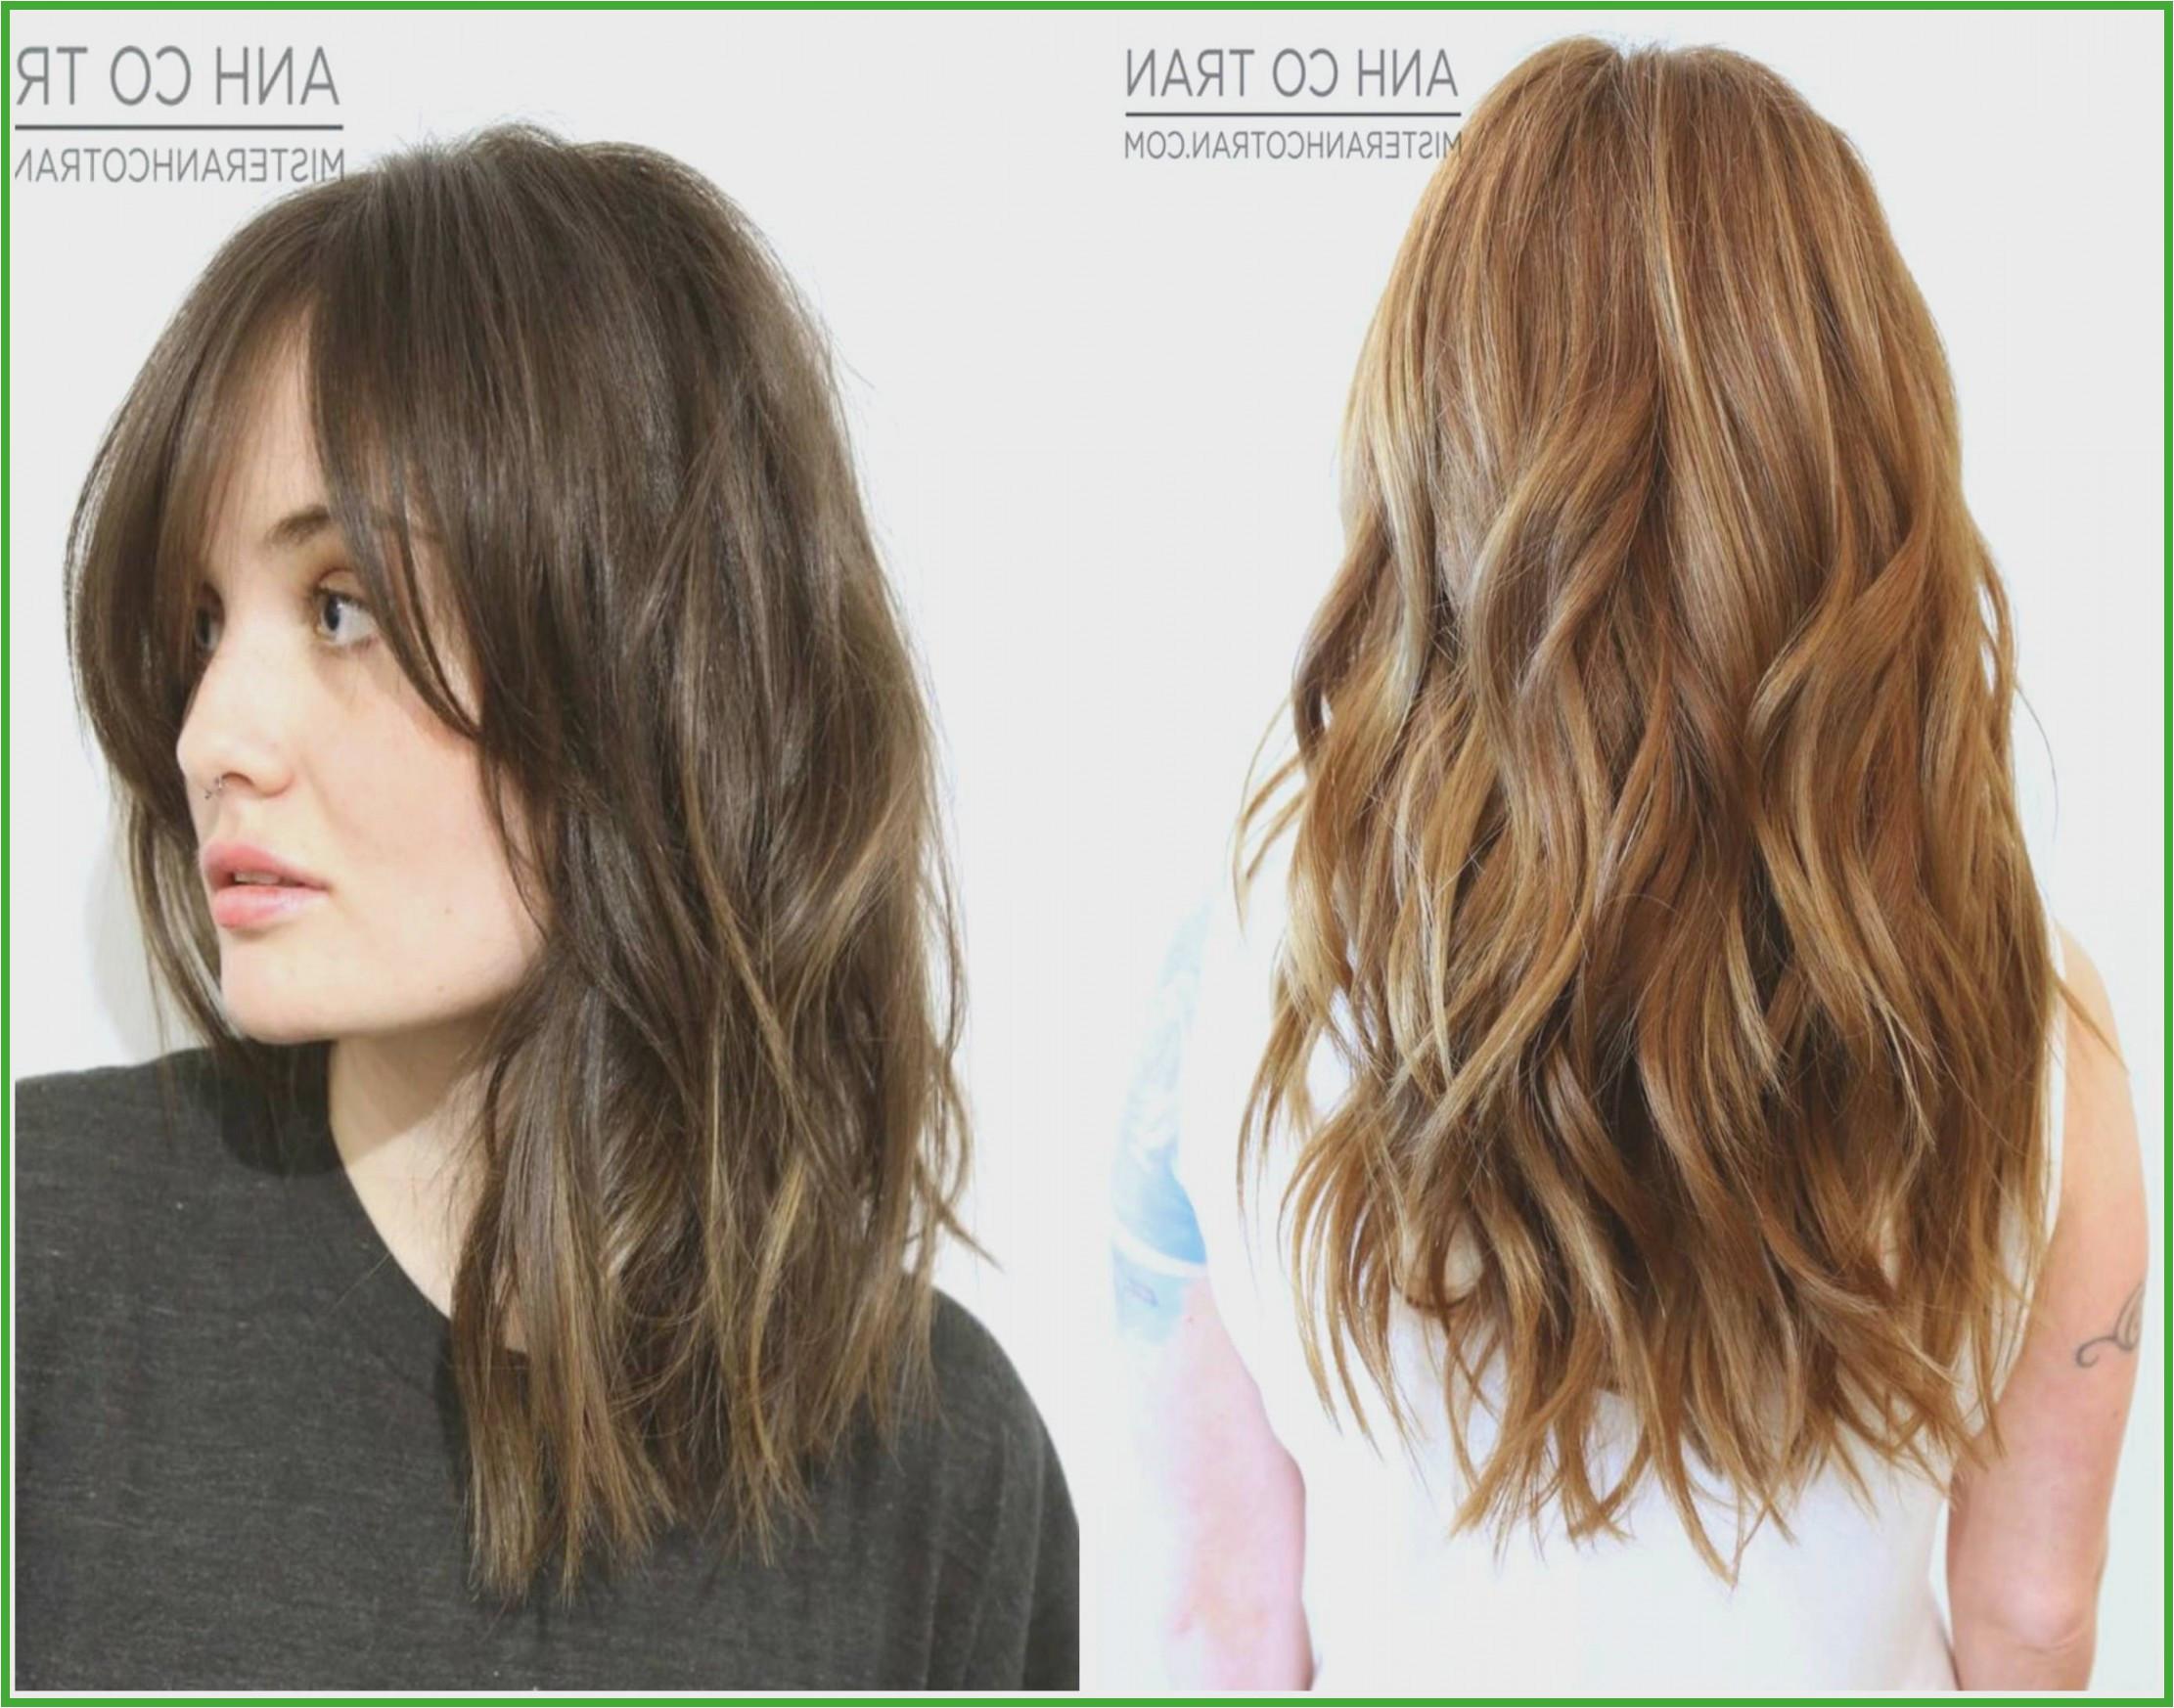 Highlights In asian Hair Elegant Medium Curled Hair Very Curly Hairstyles Fresh Curly Hair 0d